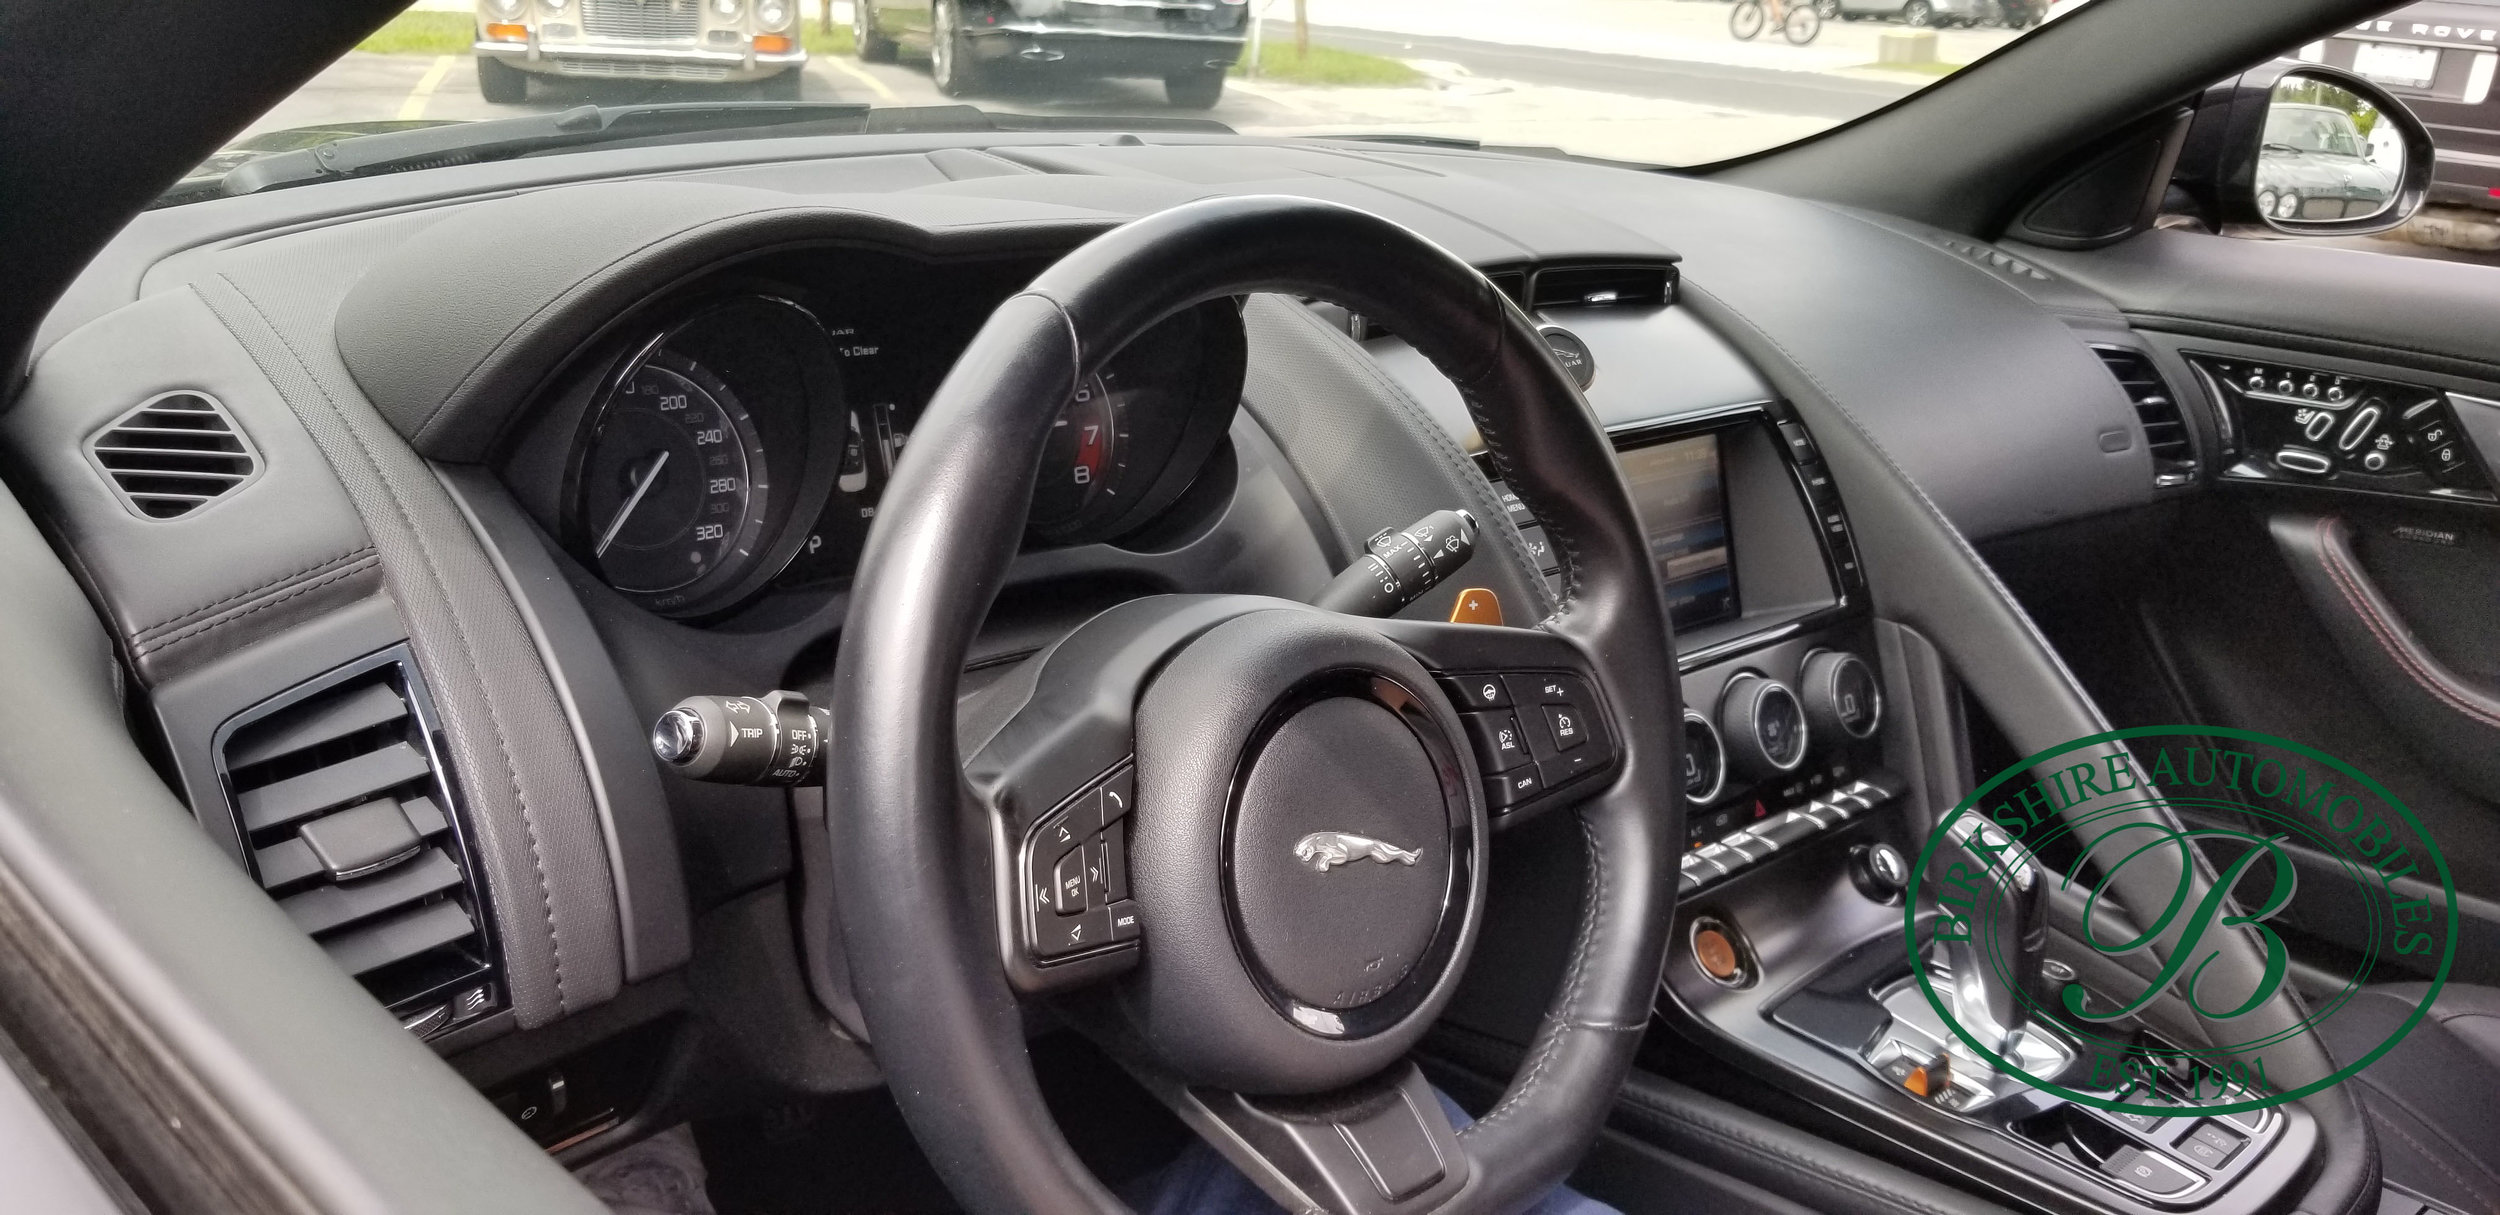 2014 F-Type V8 S - Birkshire Automobiles (68).jpg